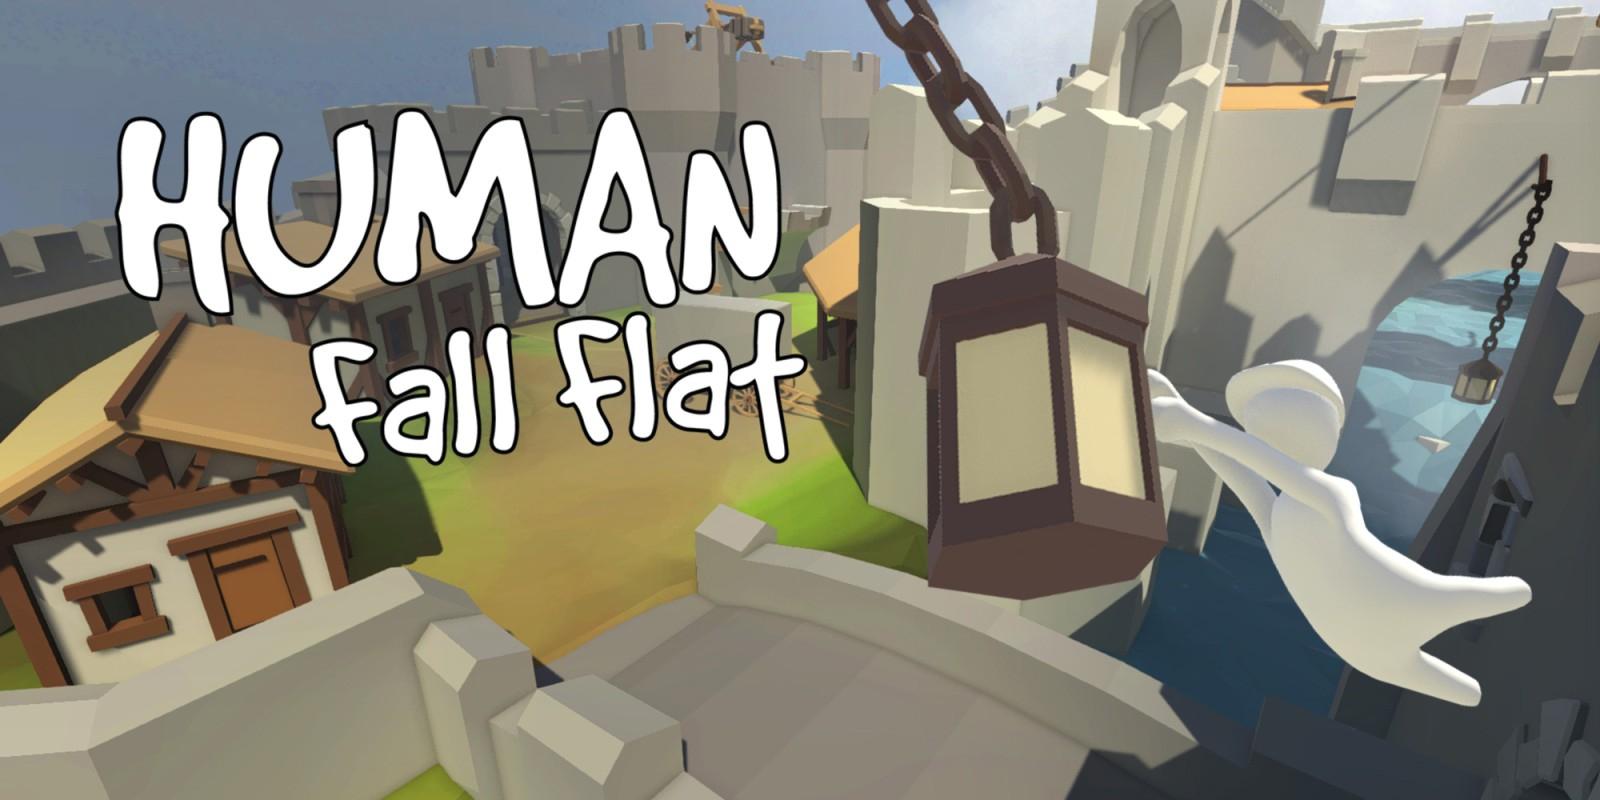 [Steam] Human: Fall Flat für 1,99€ @ Gamivo